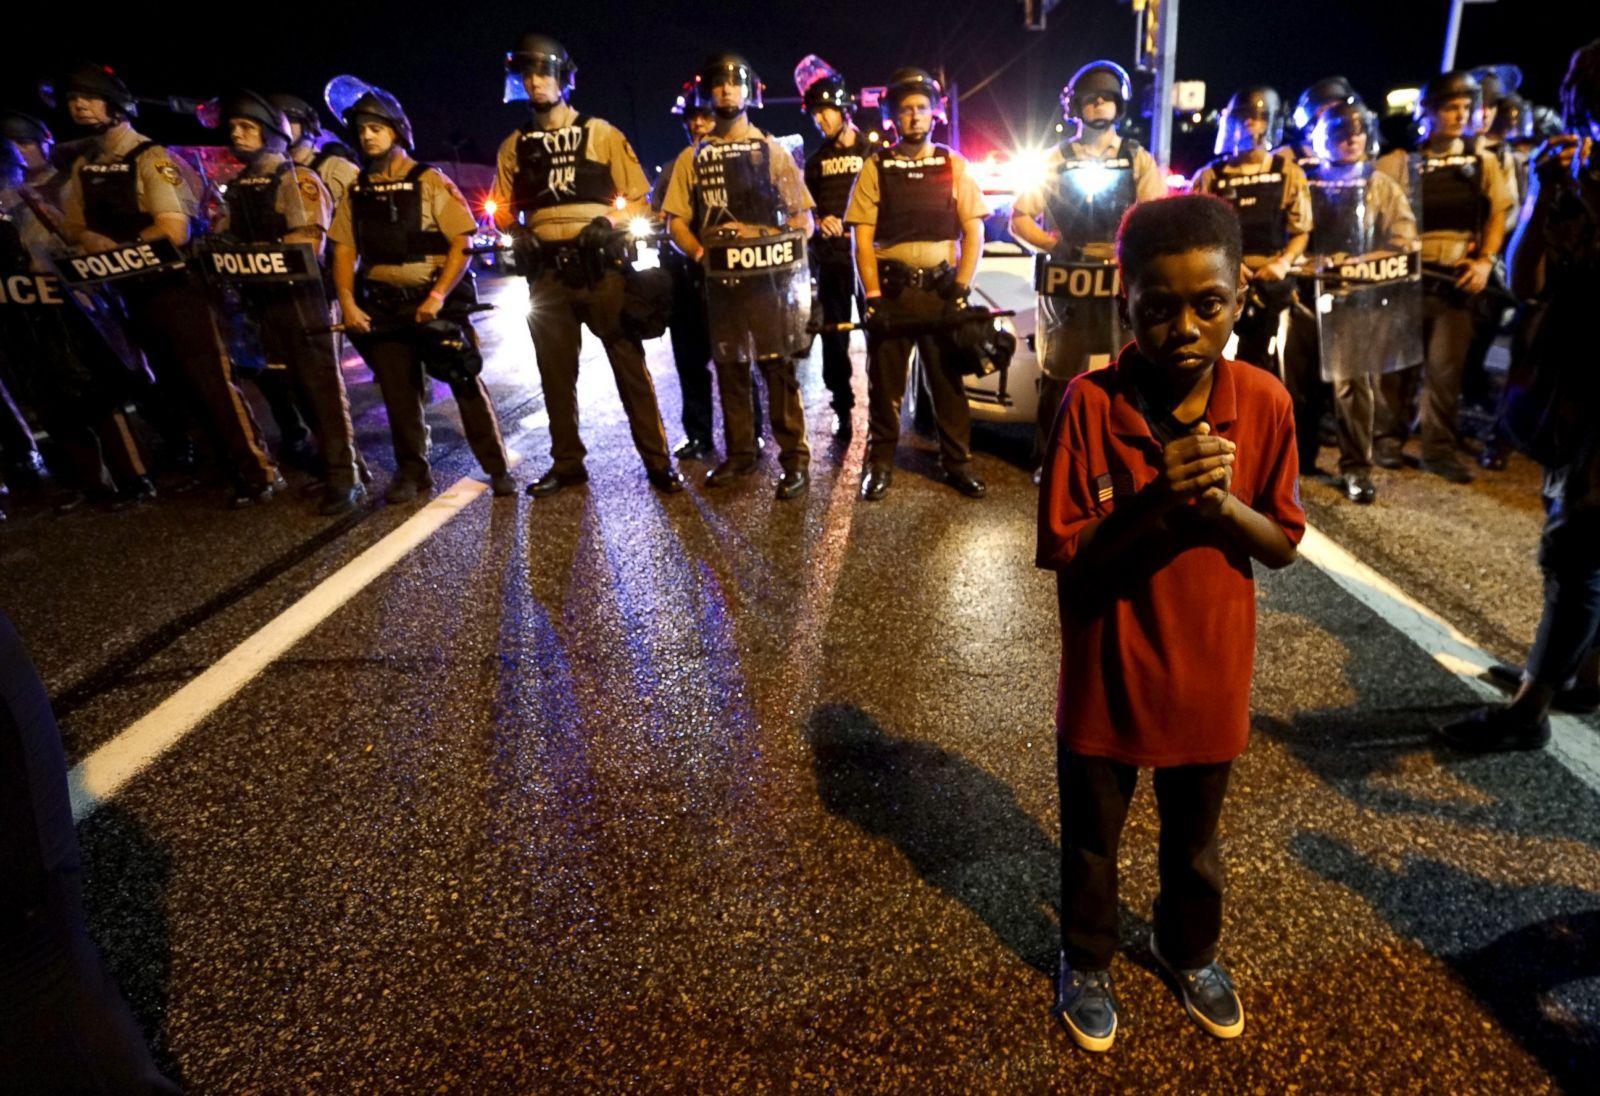 Powerful Scenes From Ferguson, Missouri Photos - ABC News